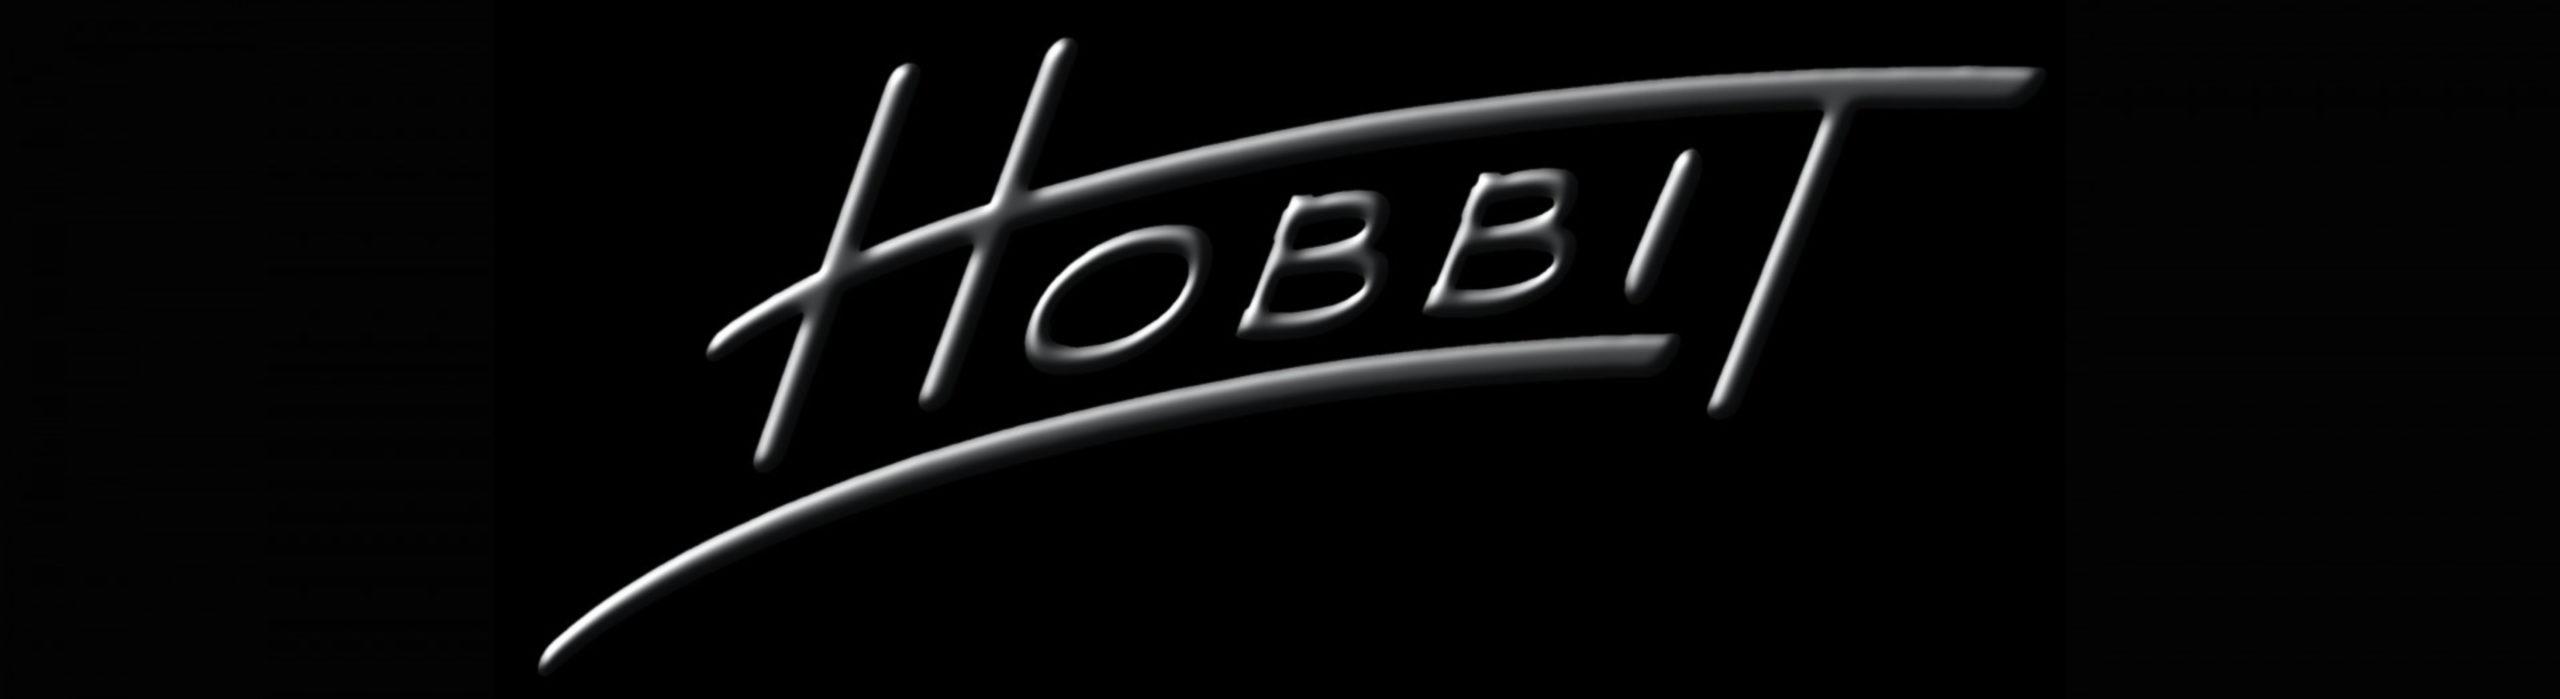 Hobbit Musictainment